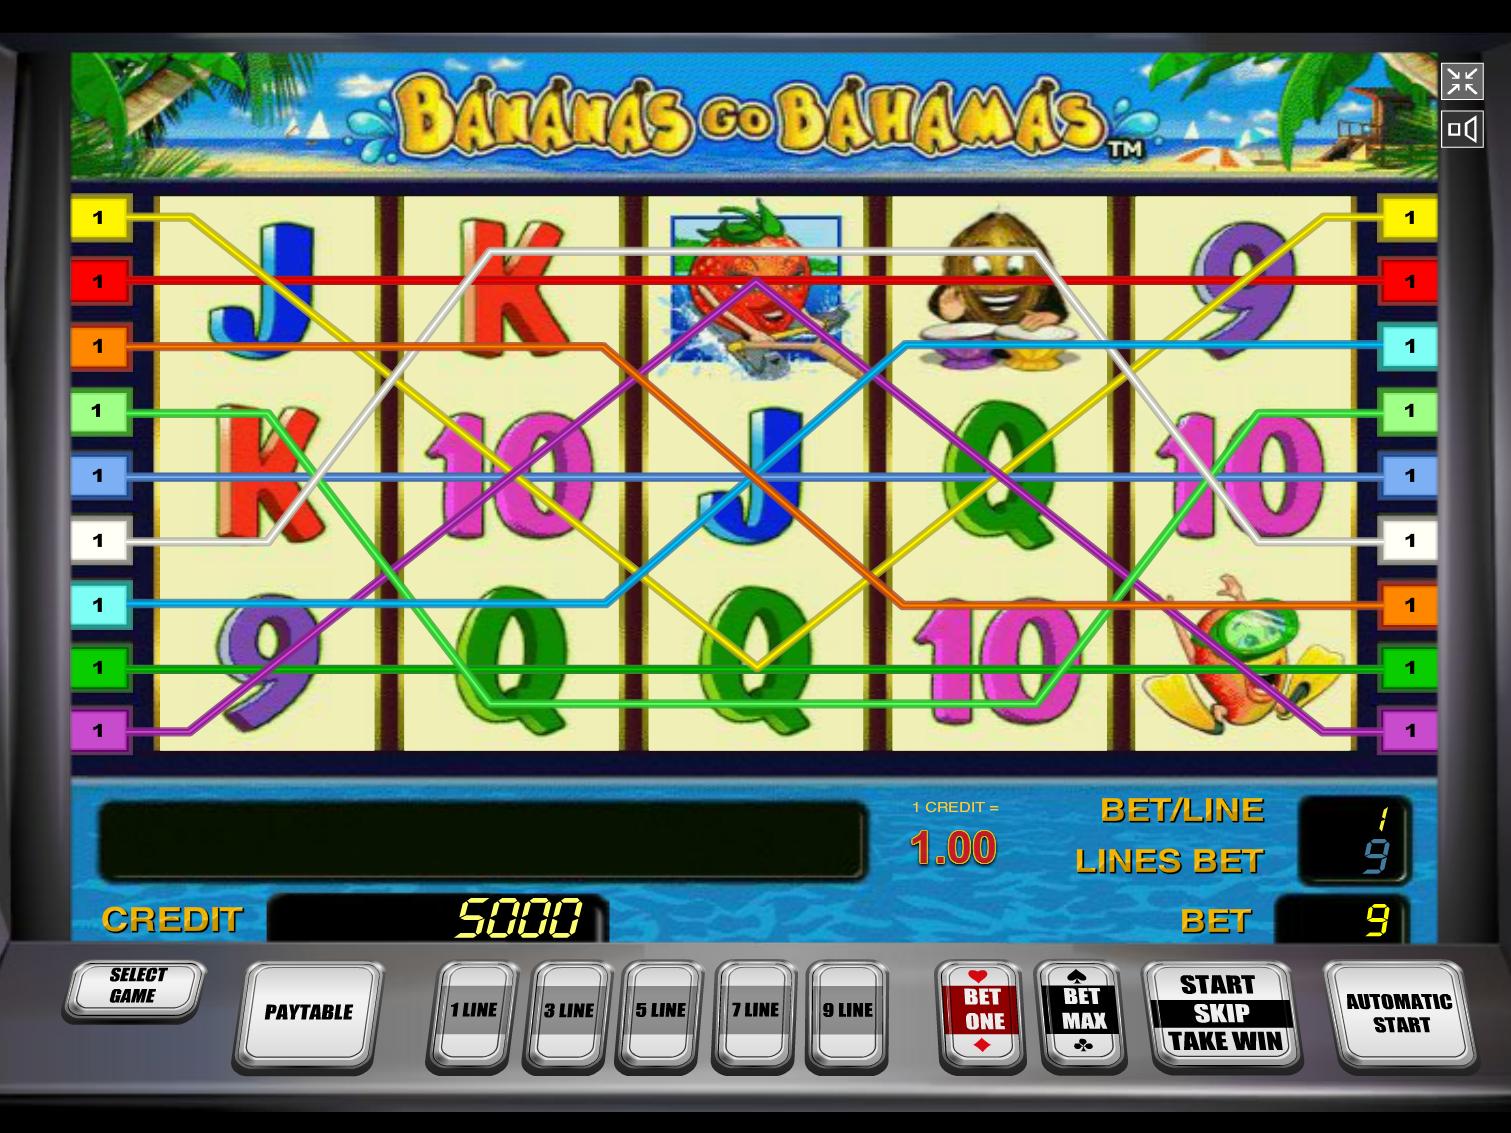 Jetzt Bananas Go Bahamas online spielen